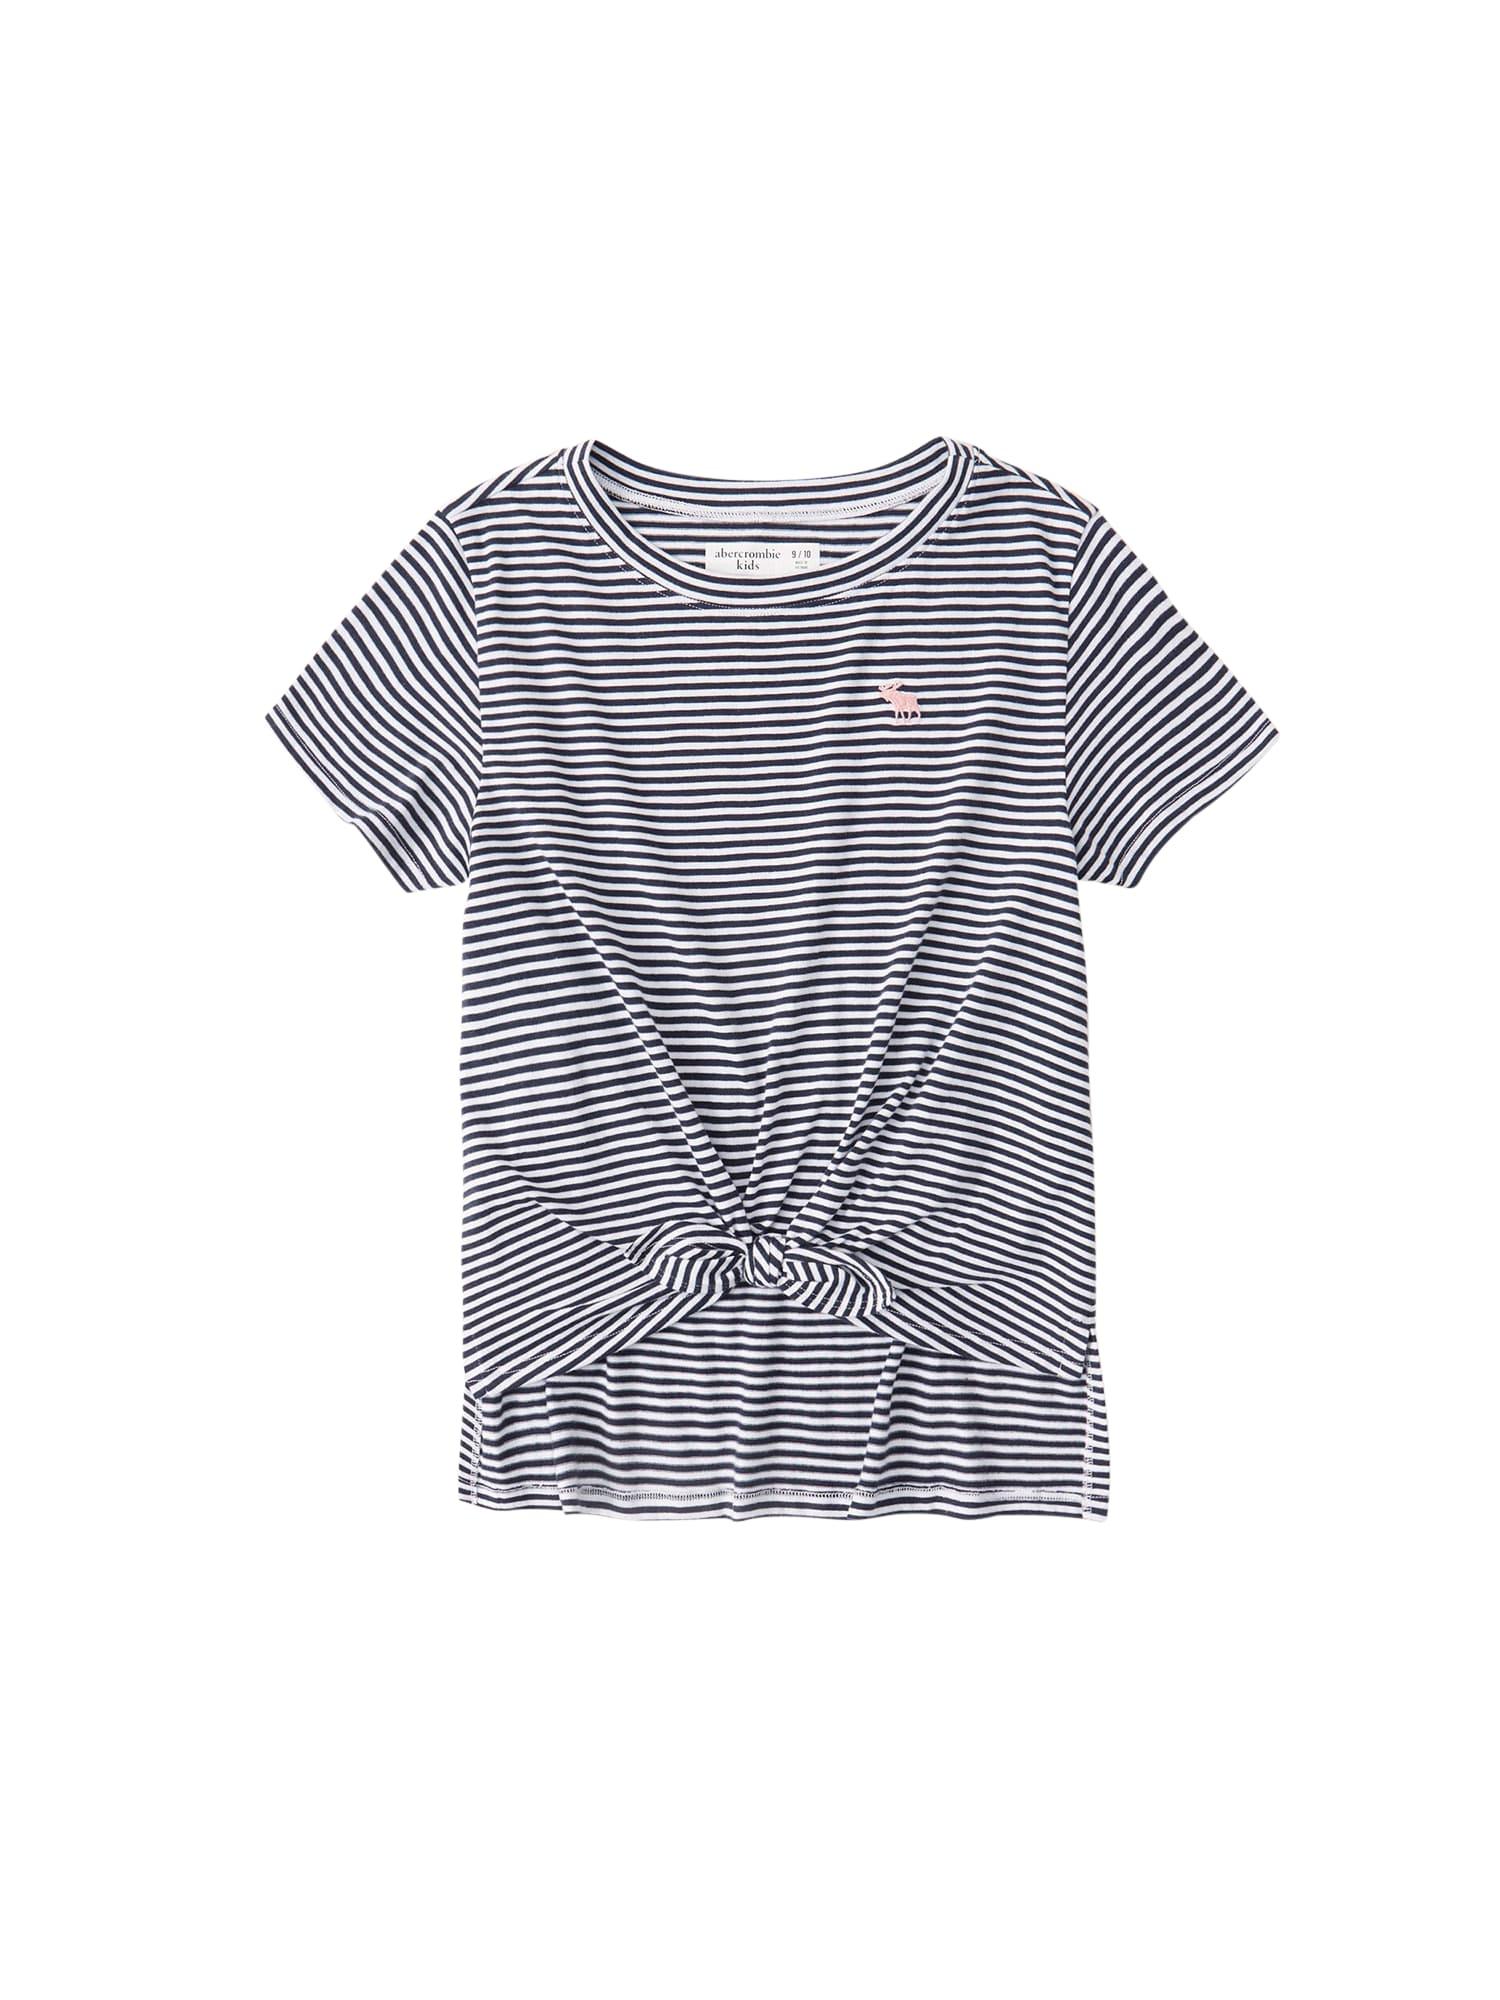 Abercrombie & Fitch Marškinėliai pilka / balta